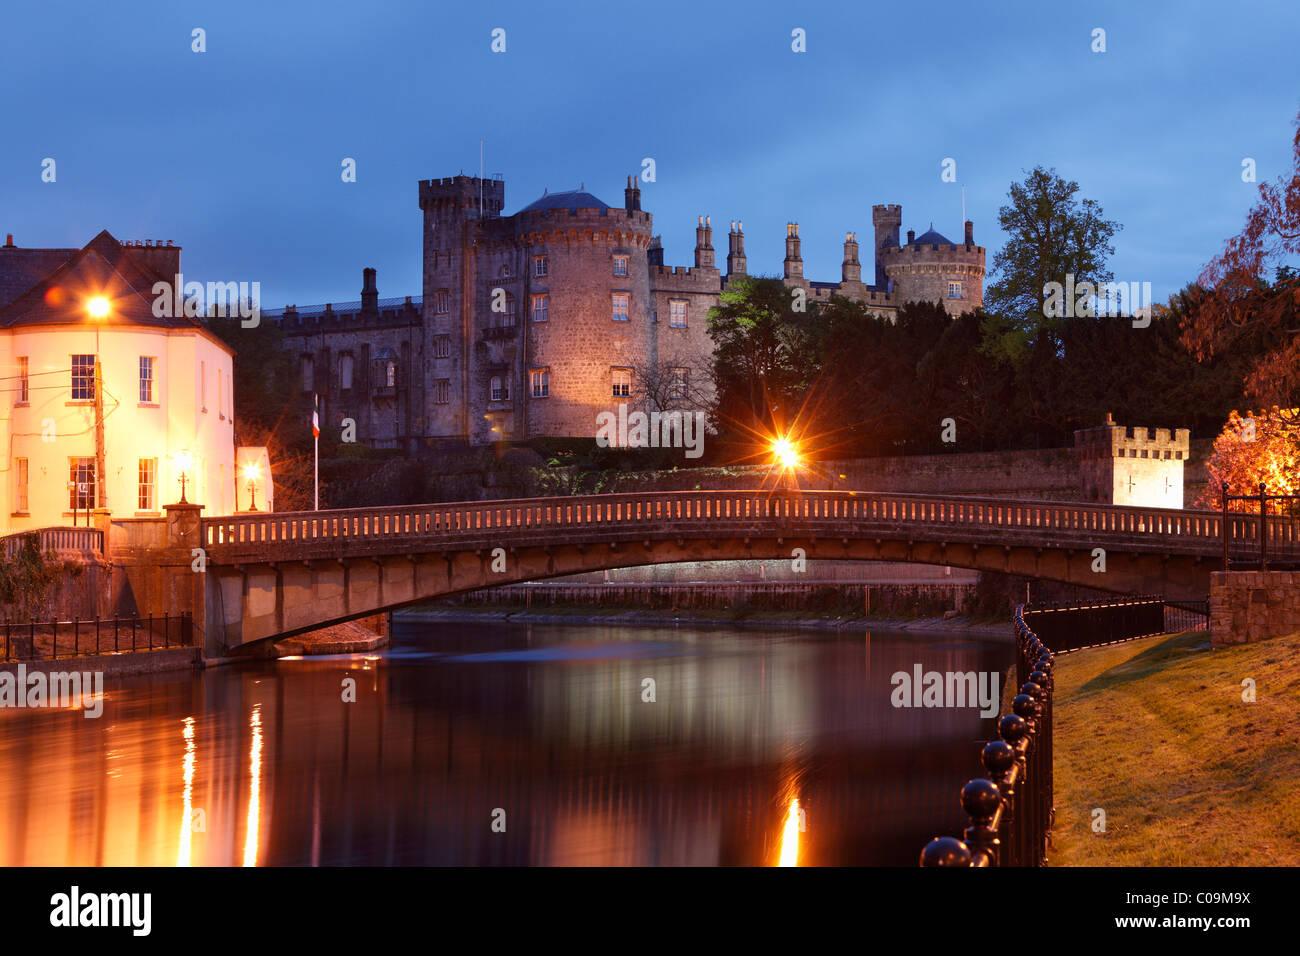 Kilkenny Castle, River Nore, County Kilkenny, Republic of Ireland, British Isles, Europe - Stock Image